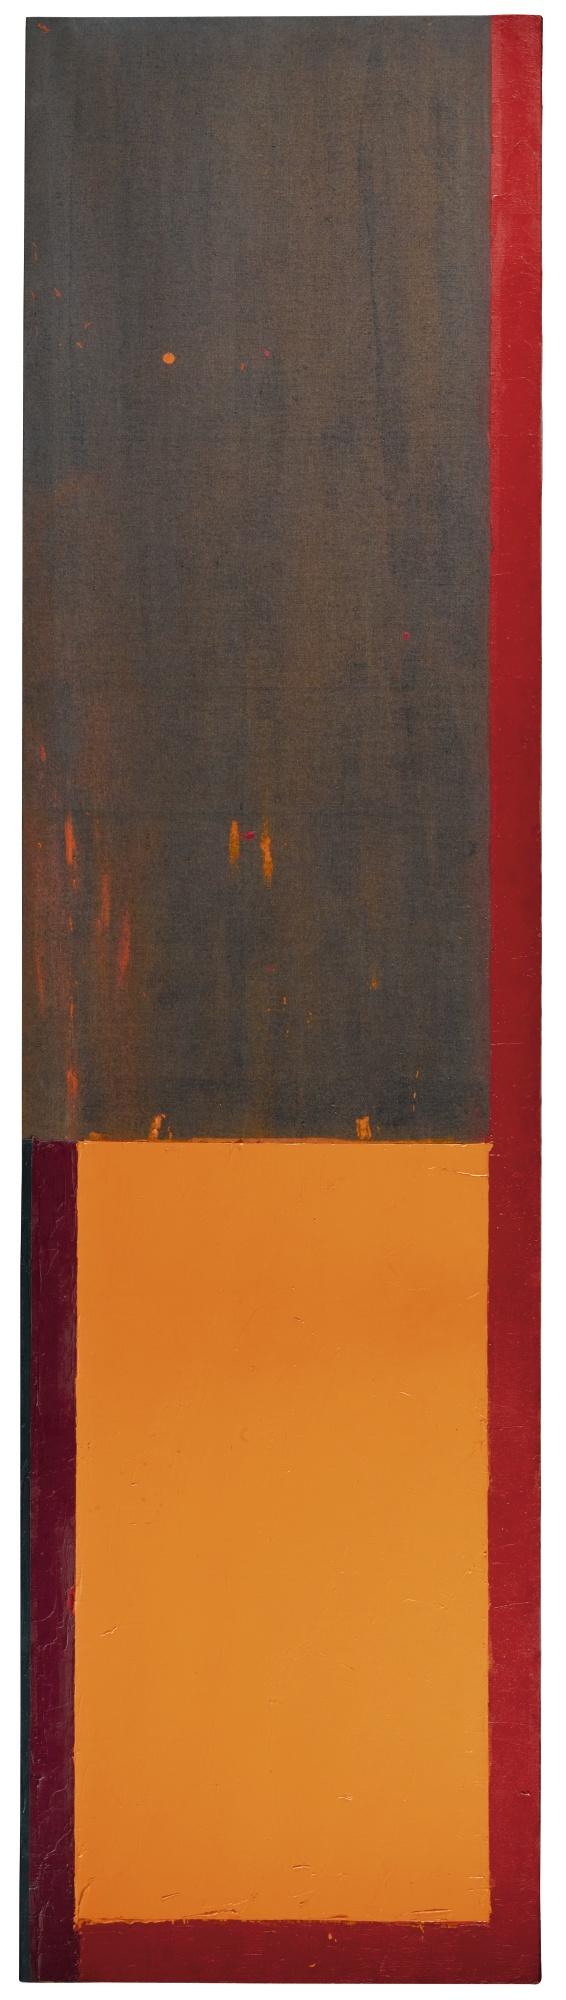 John Hoyland-28.4.68-1968